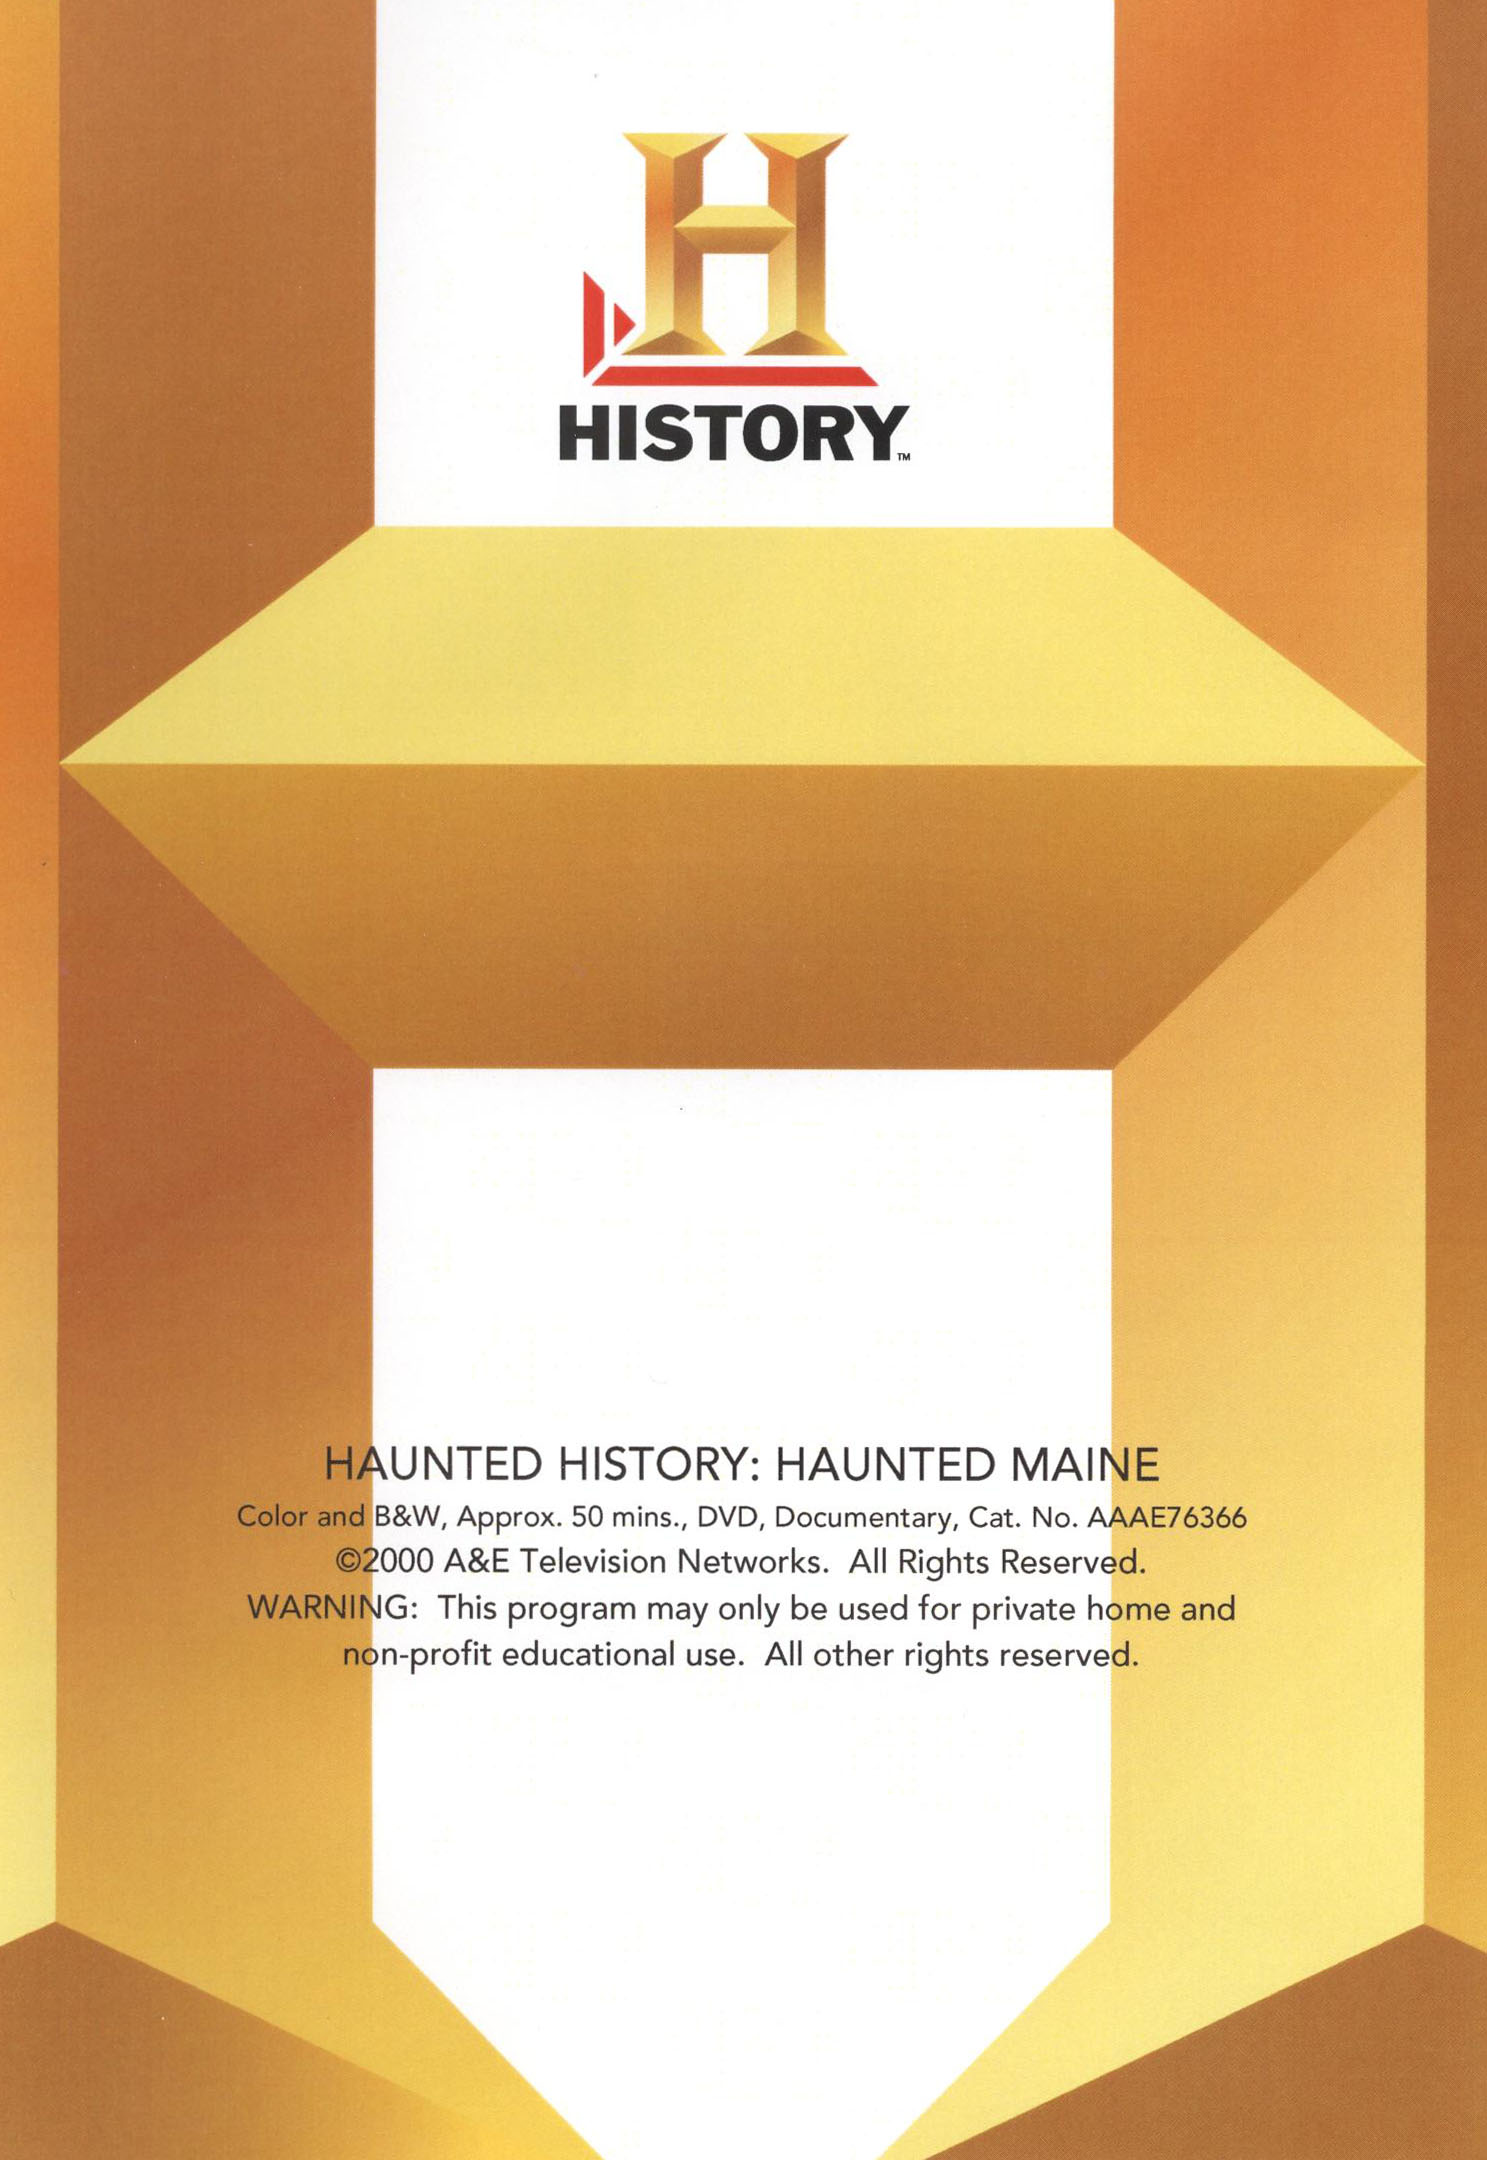 Haunted History: Haunted Maine